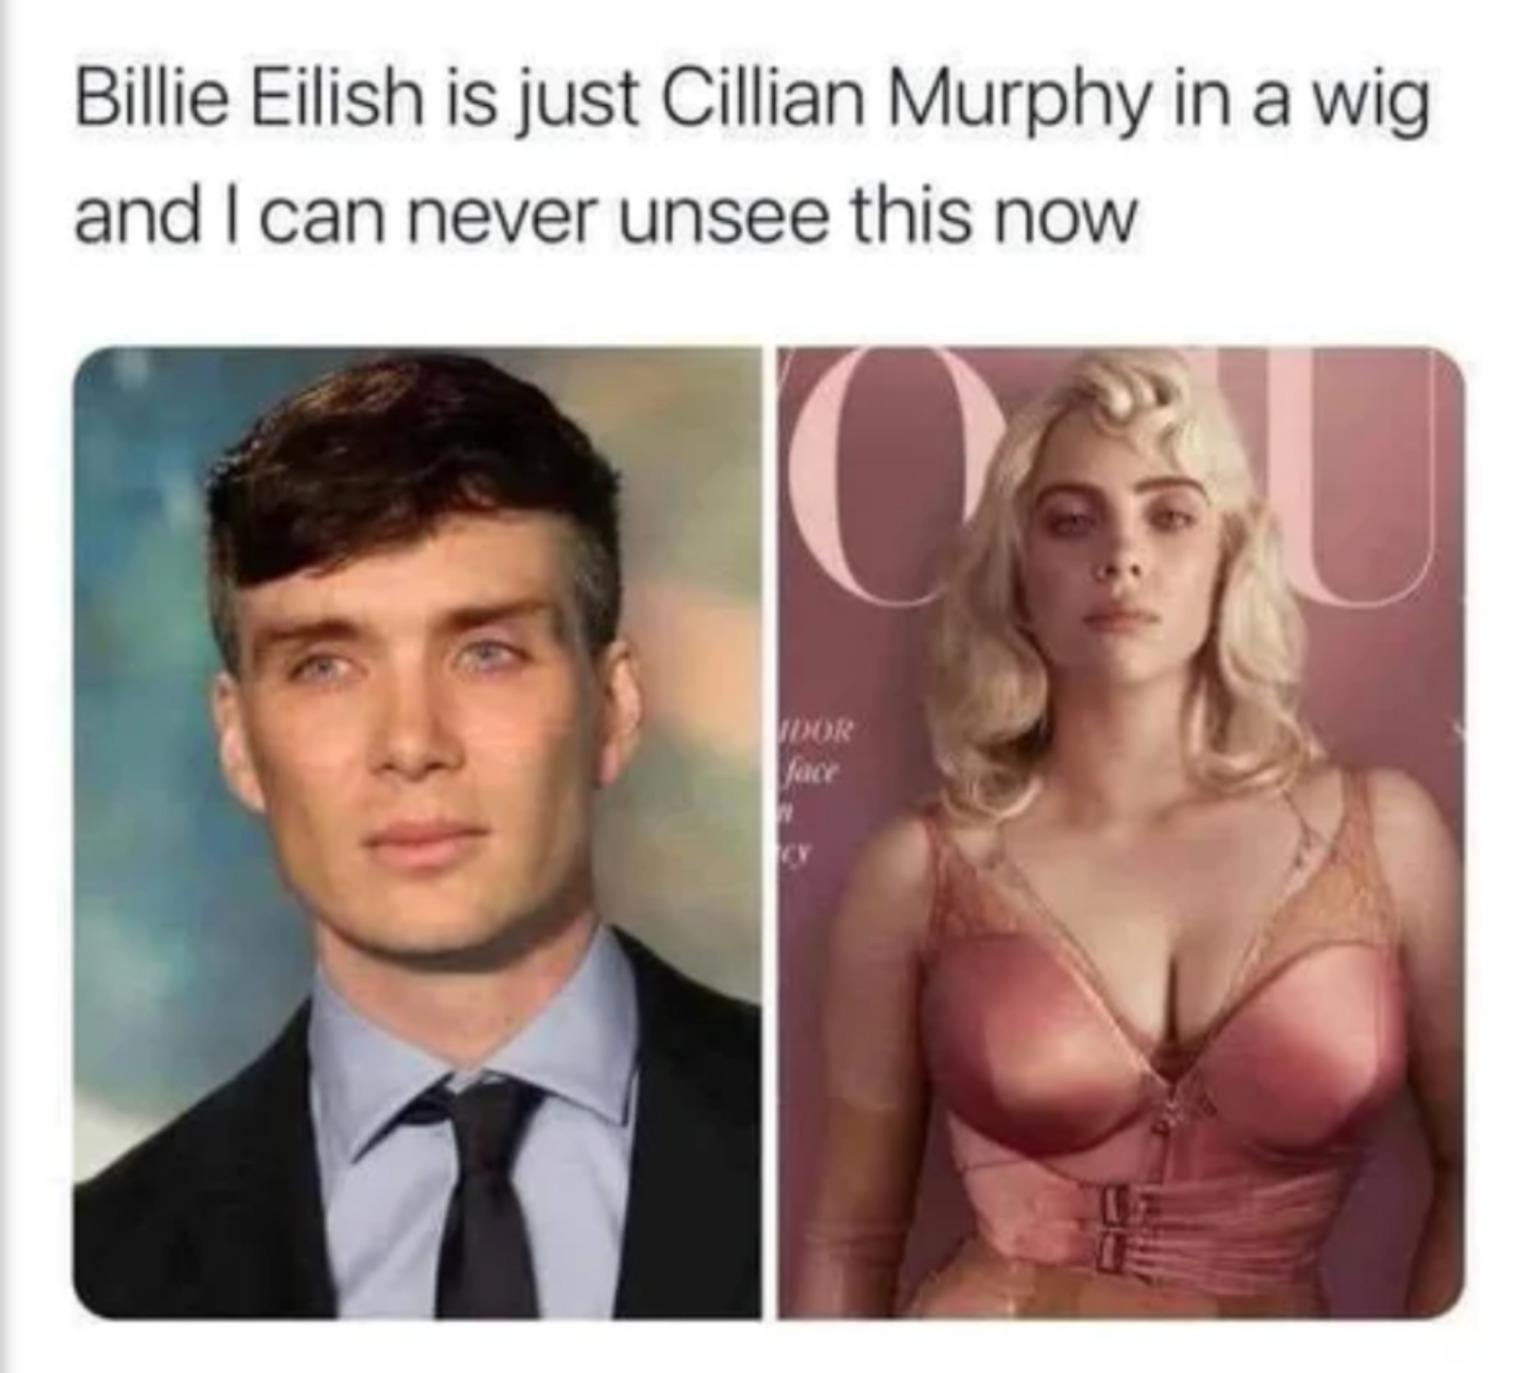 Similarities are incredible uncanny - meme